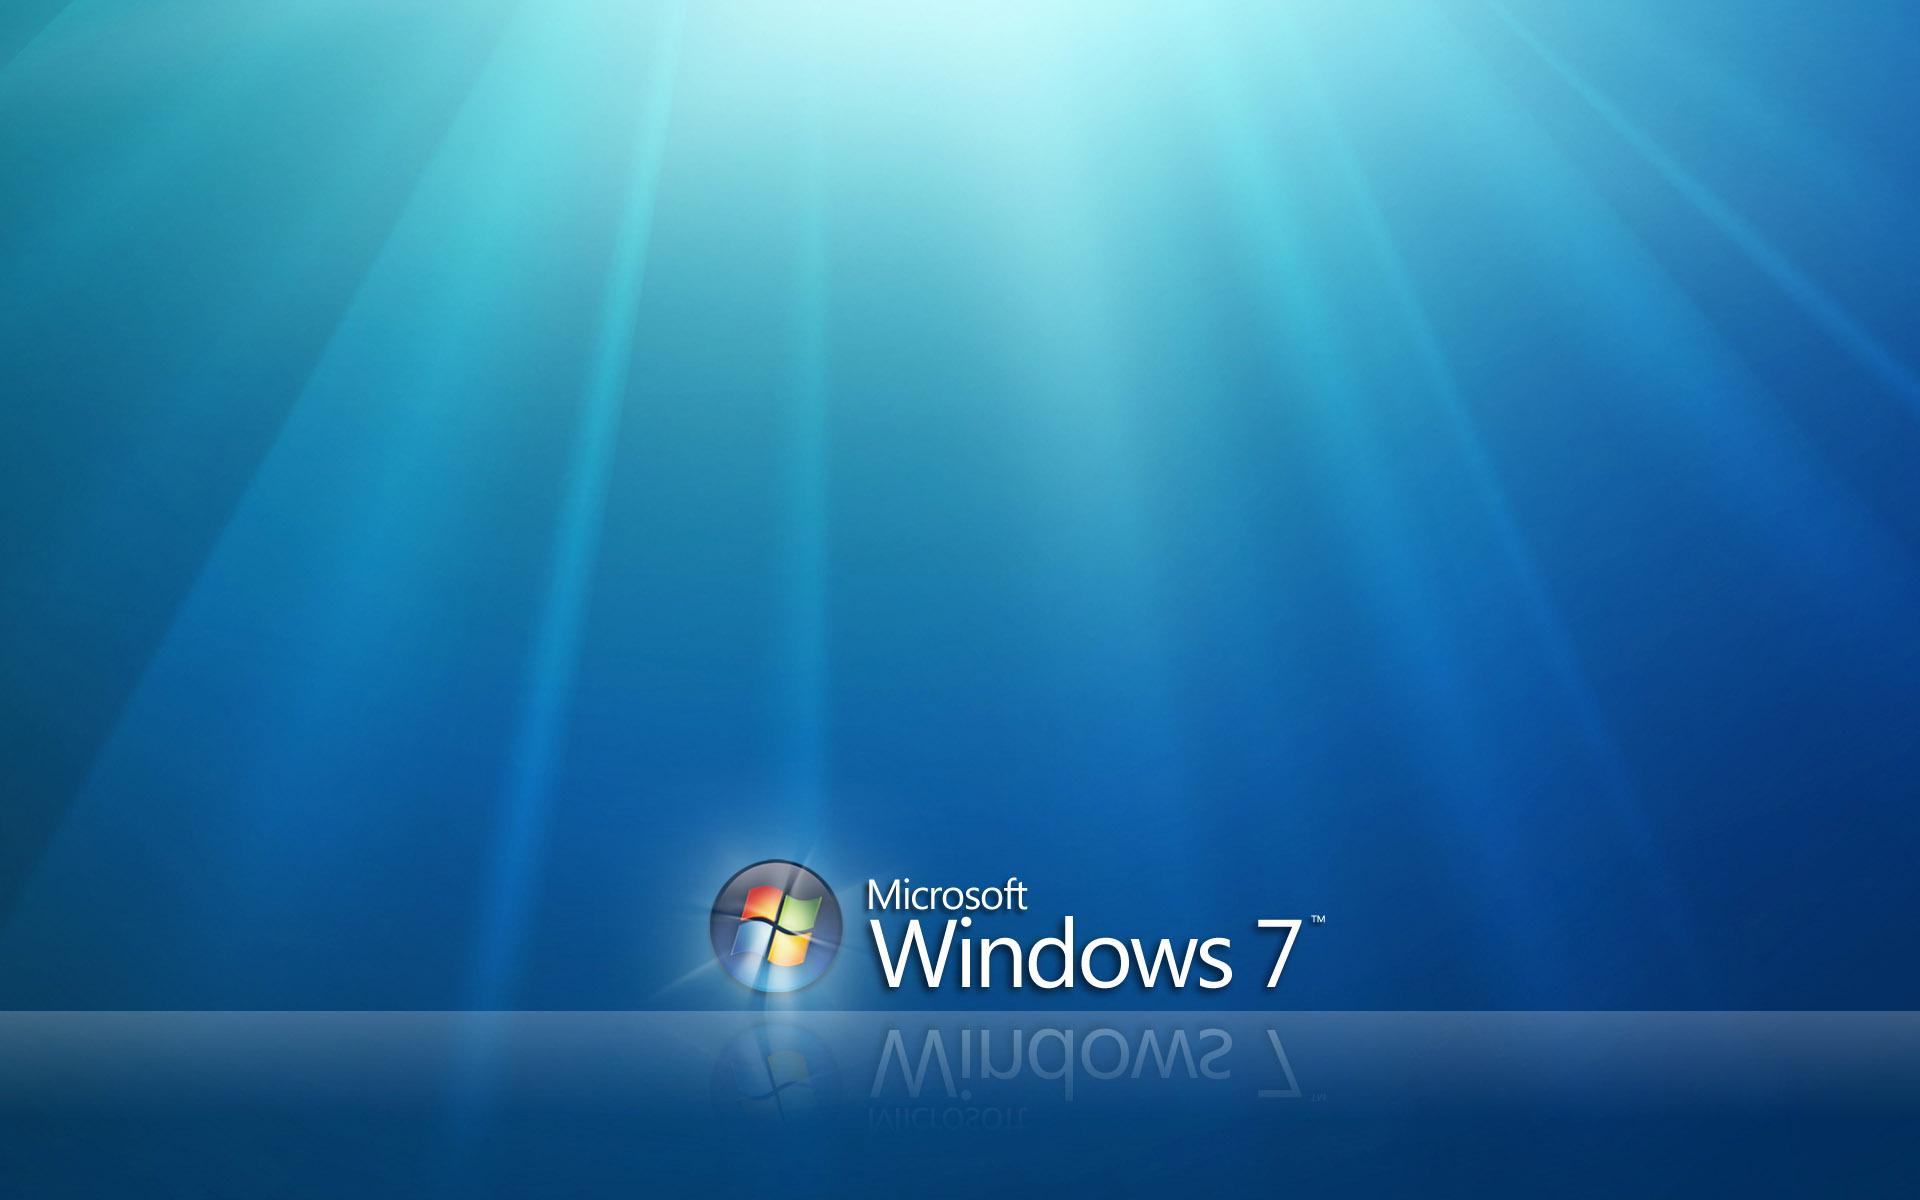 Windows 7 Whacked Wallpaper: Windows Se7en Wallpaper Set 22 « Awesome Wallpapers